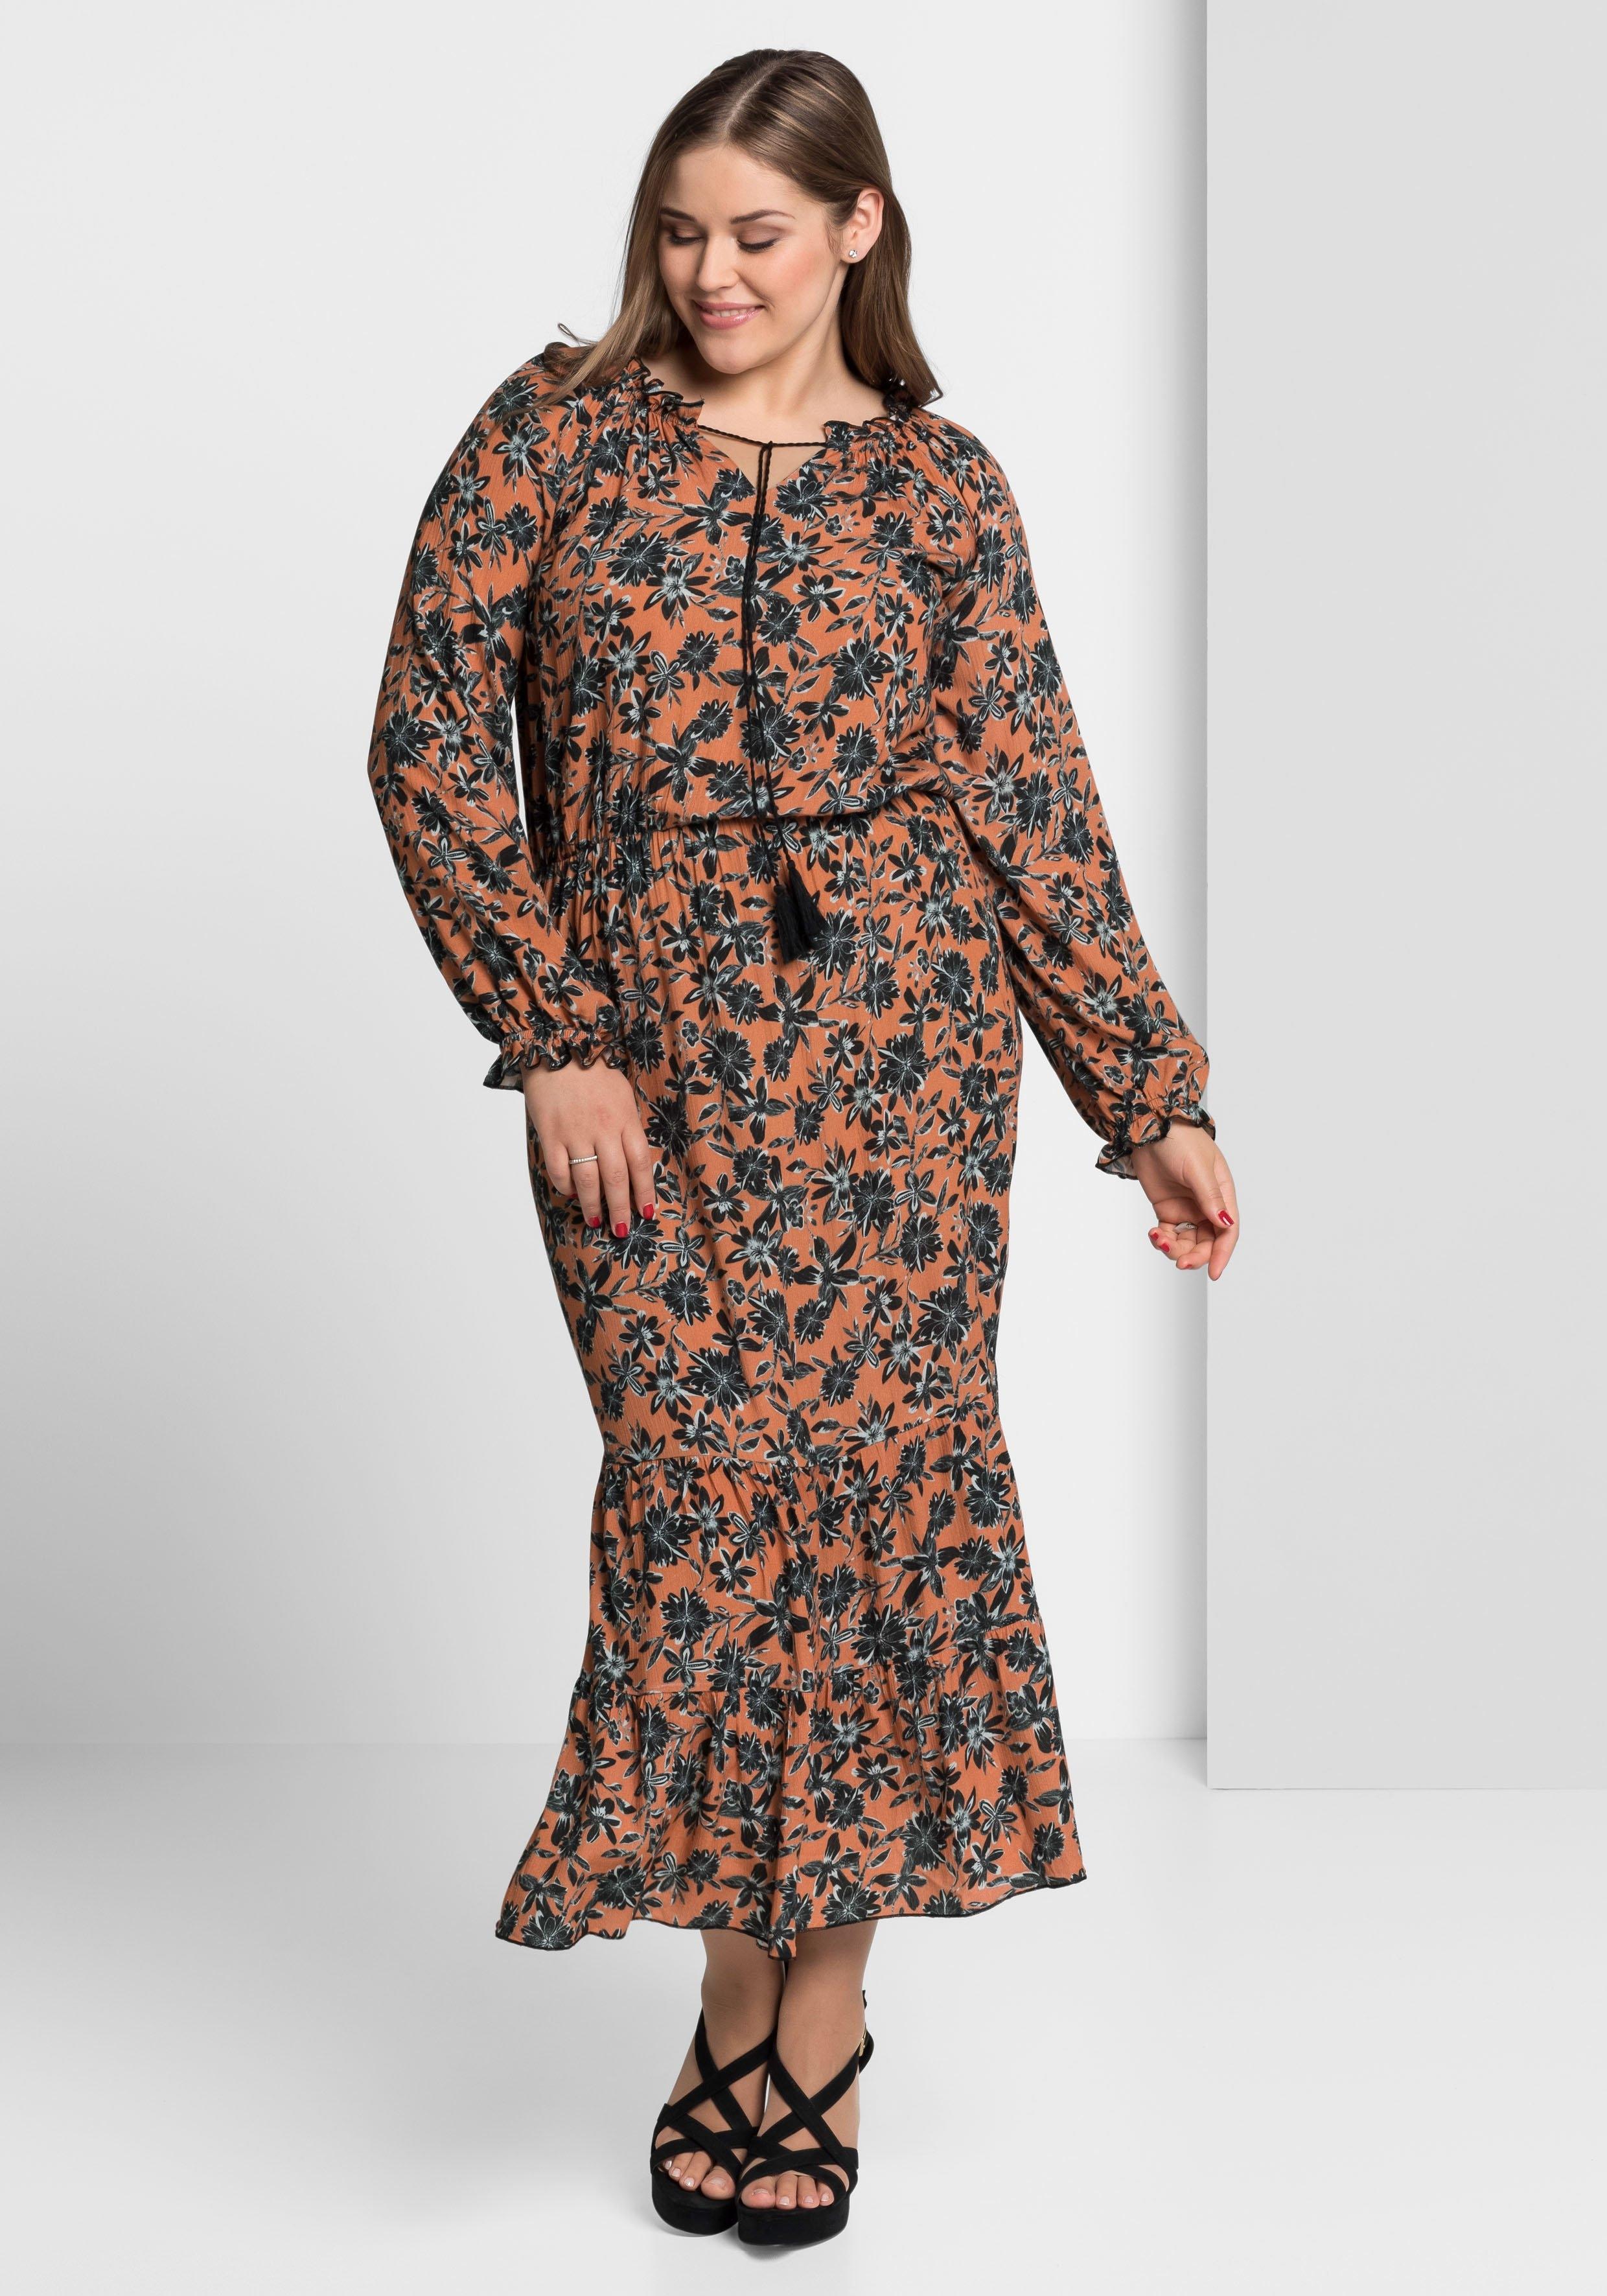 Anna Scholz For Sheego maxi-jurk bestellen: 14 dagen bedenktijd